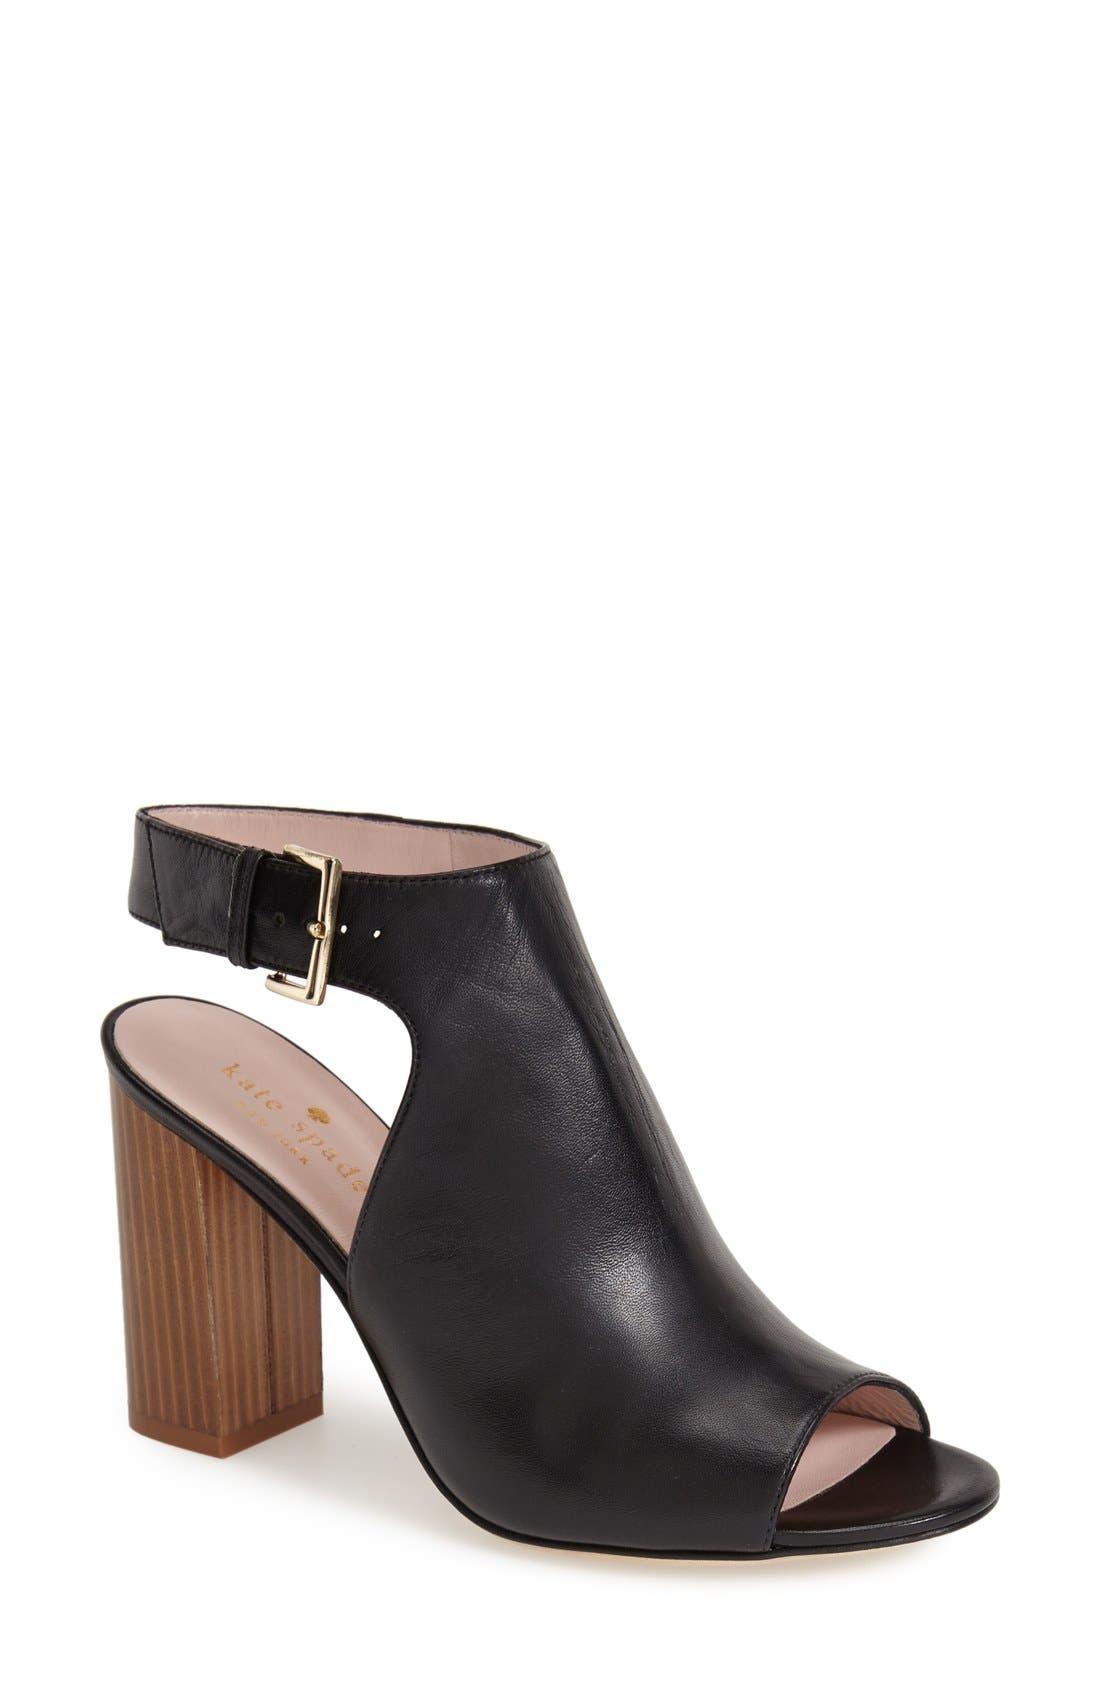 Alternate Image 1 Selected - kate spade new york 'ingrada' slingback sandal (Women)